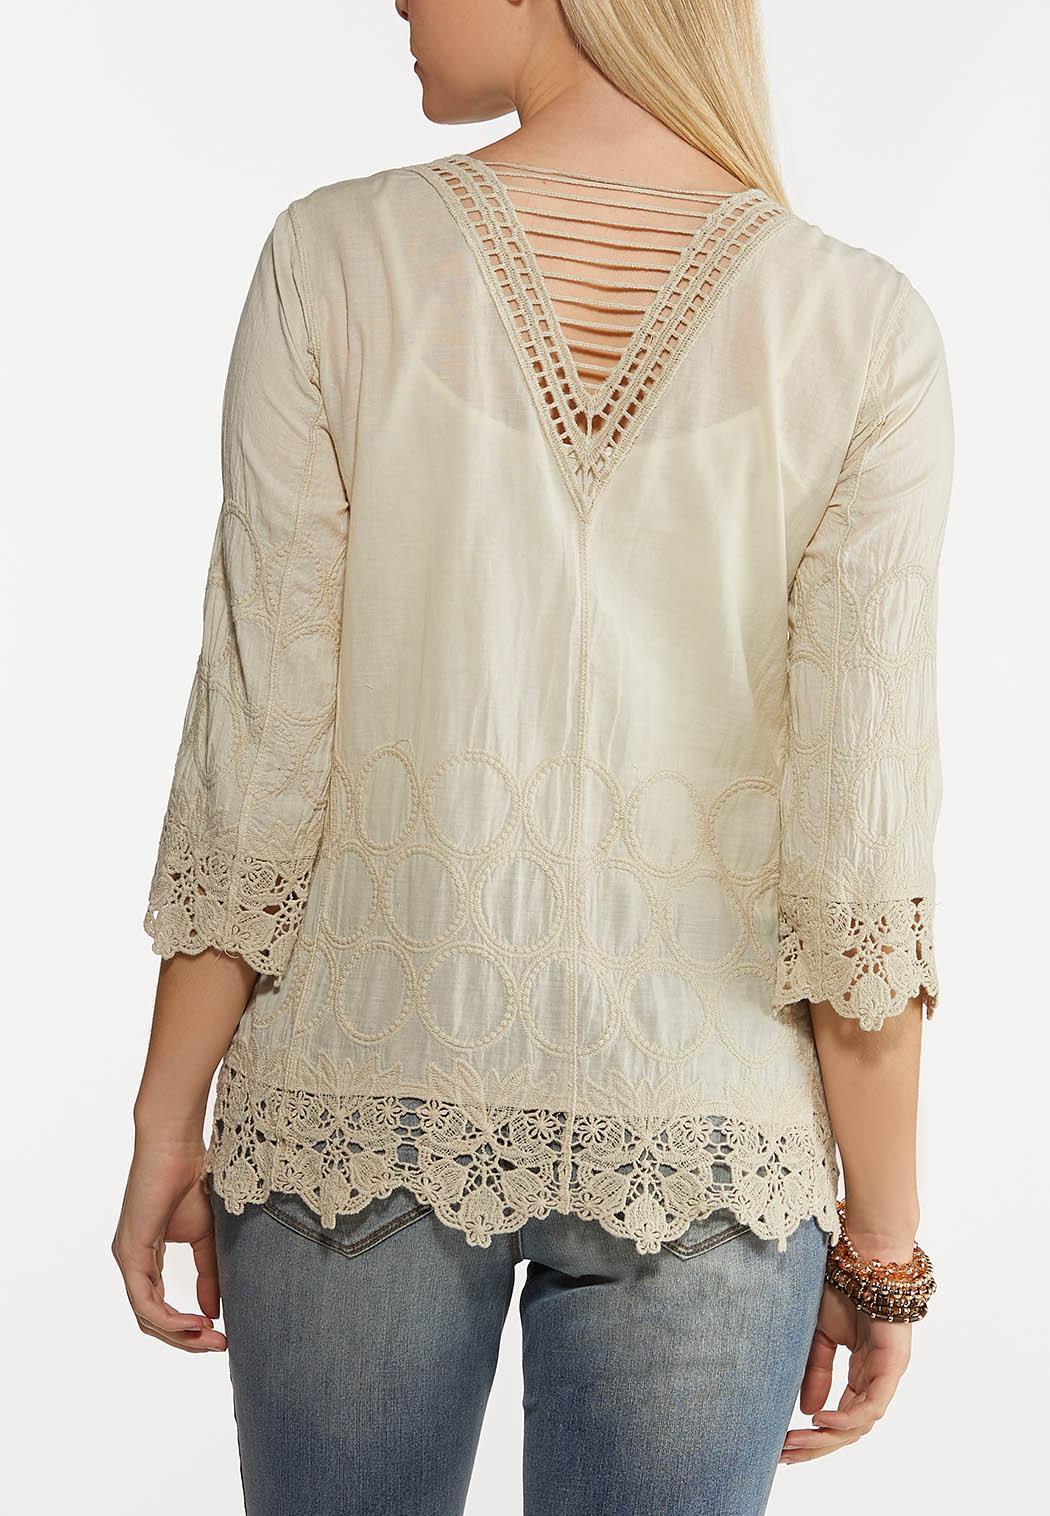 Crochet For Days Top (Item #44162735)